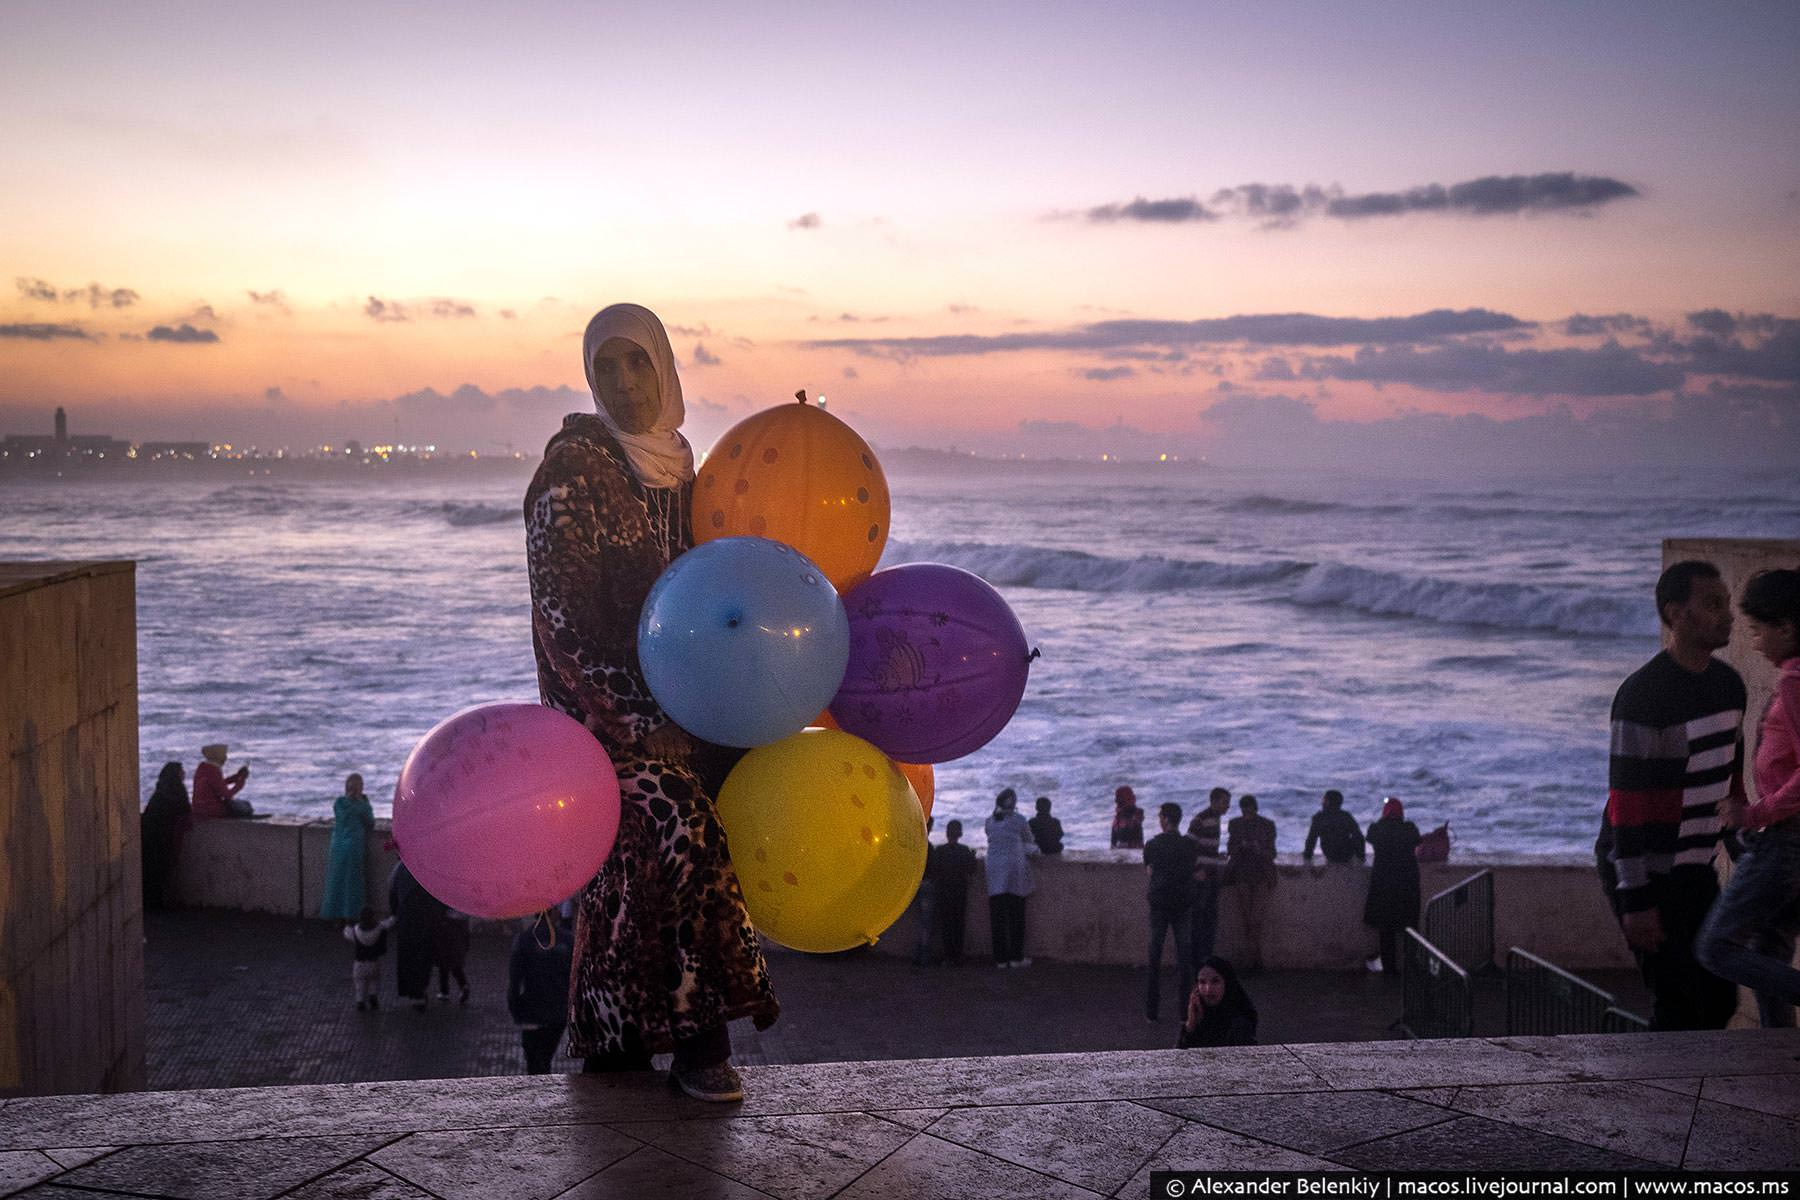 Фото: Женщина с шариками